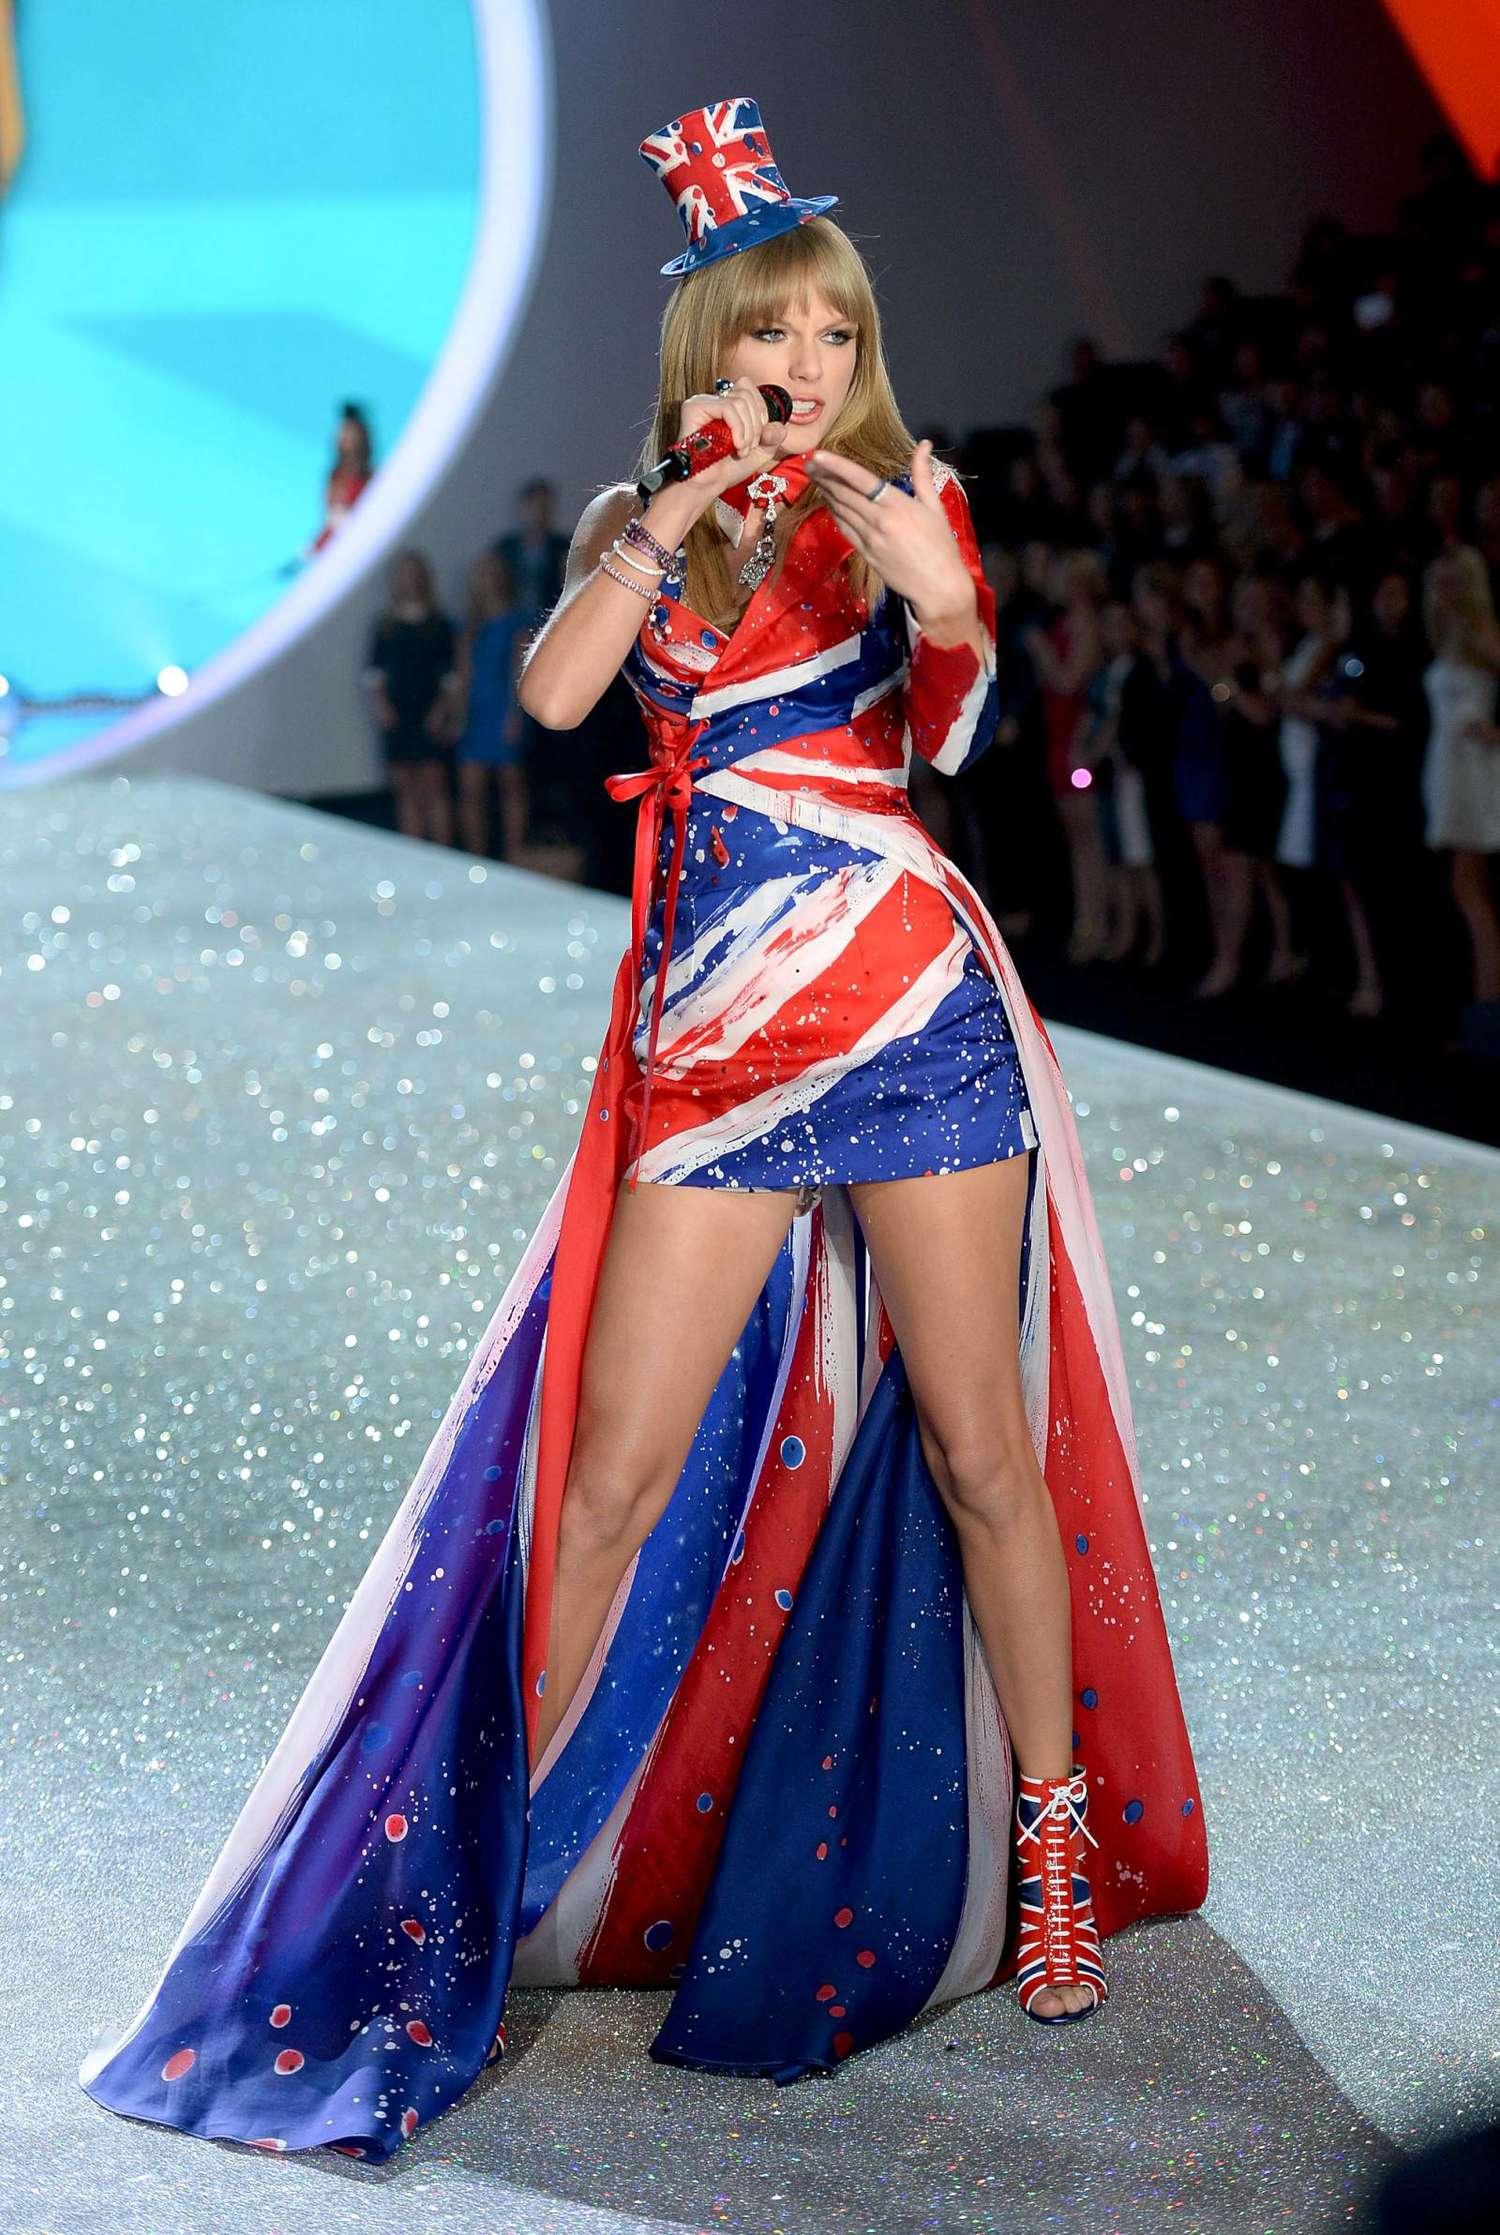 Taylor swift 2013 vs fashion show 36 gotceleb Taylor swift style live vs fashion show